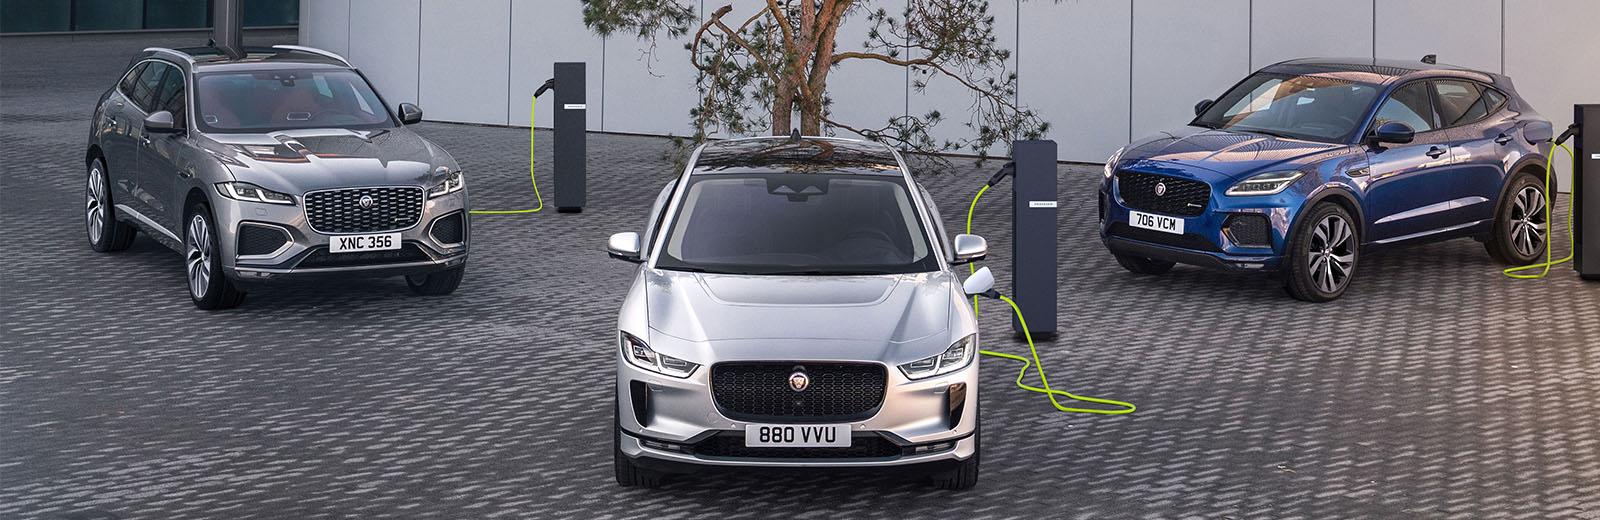 Jaguar all electric